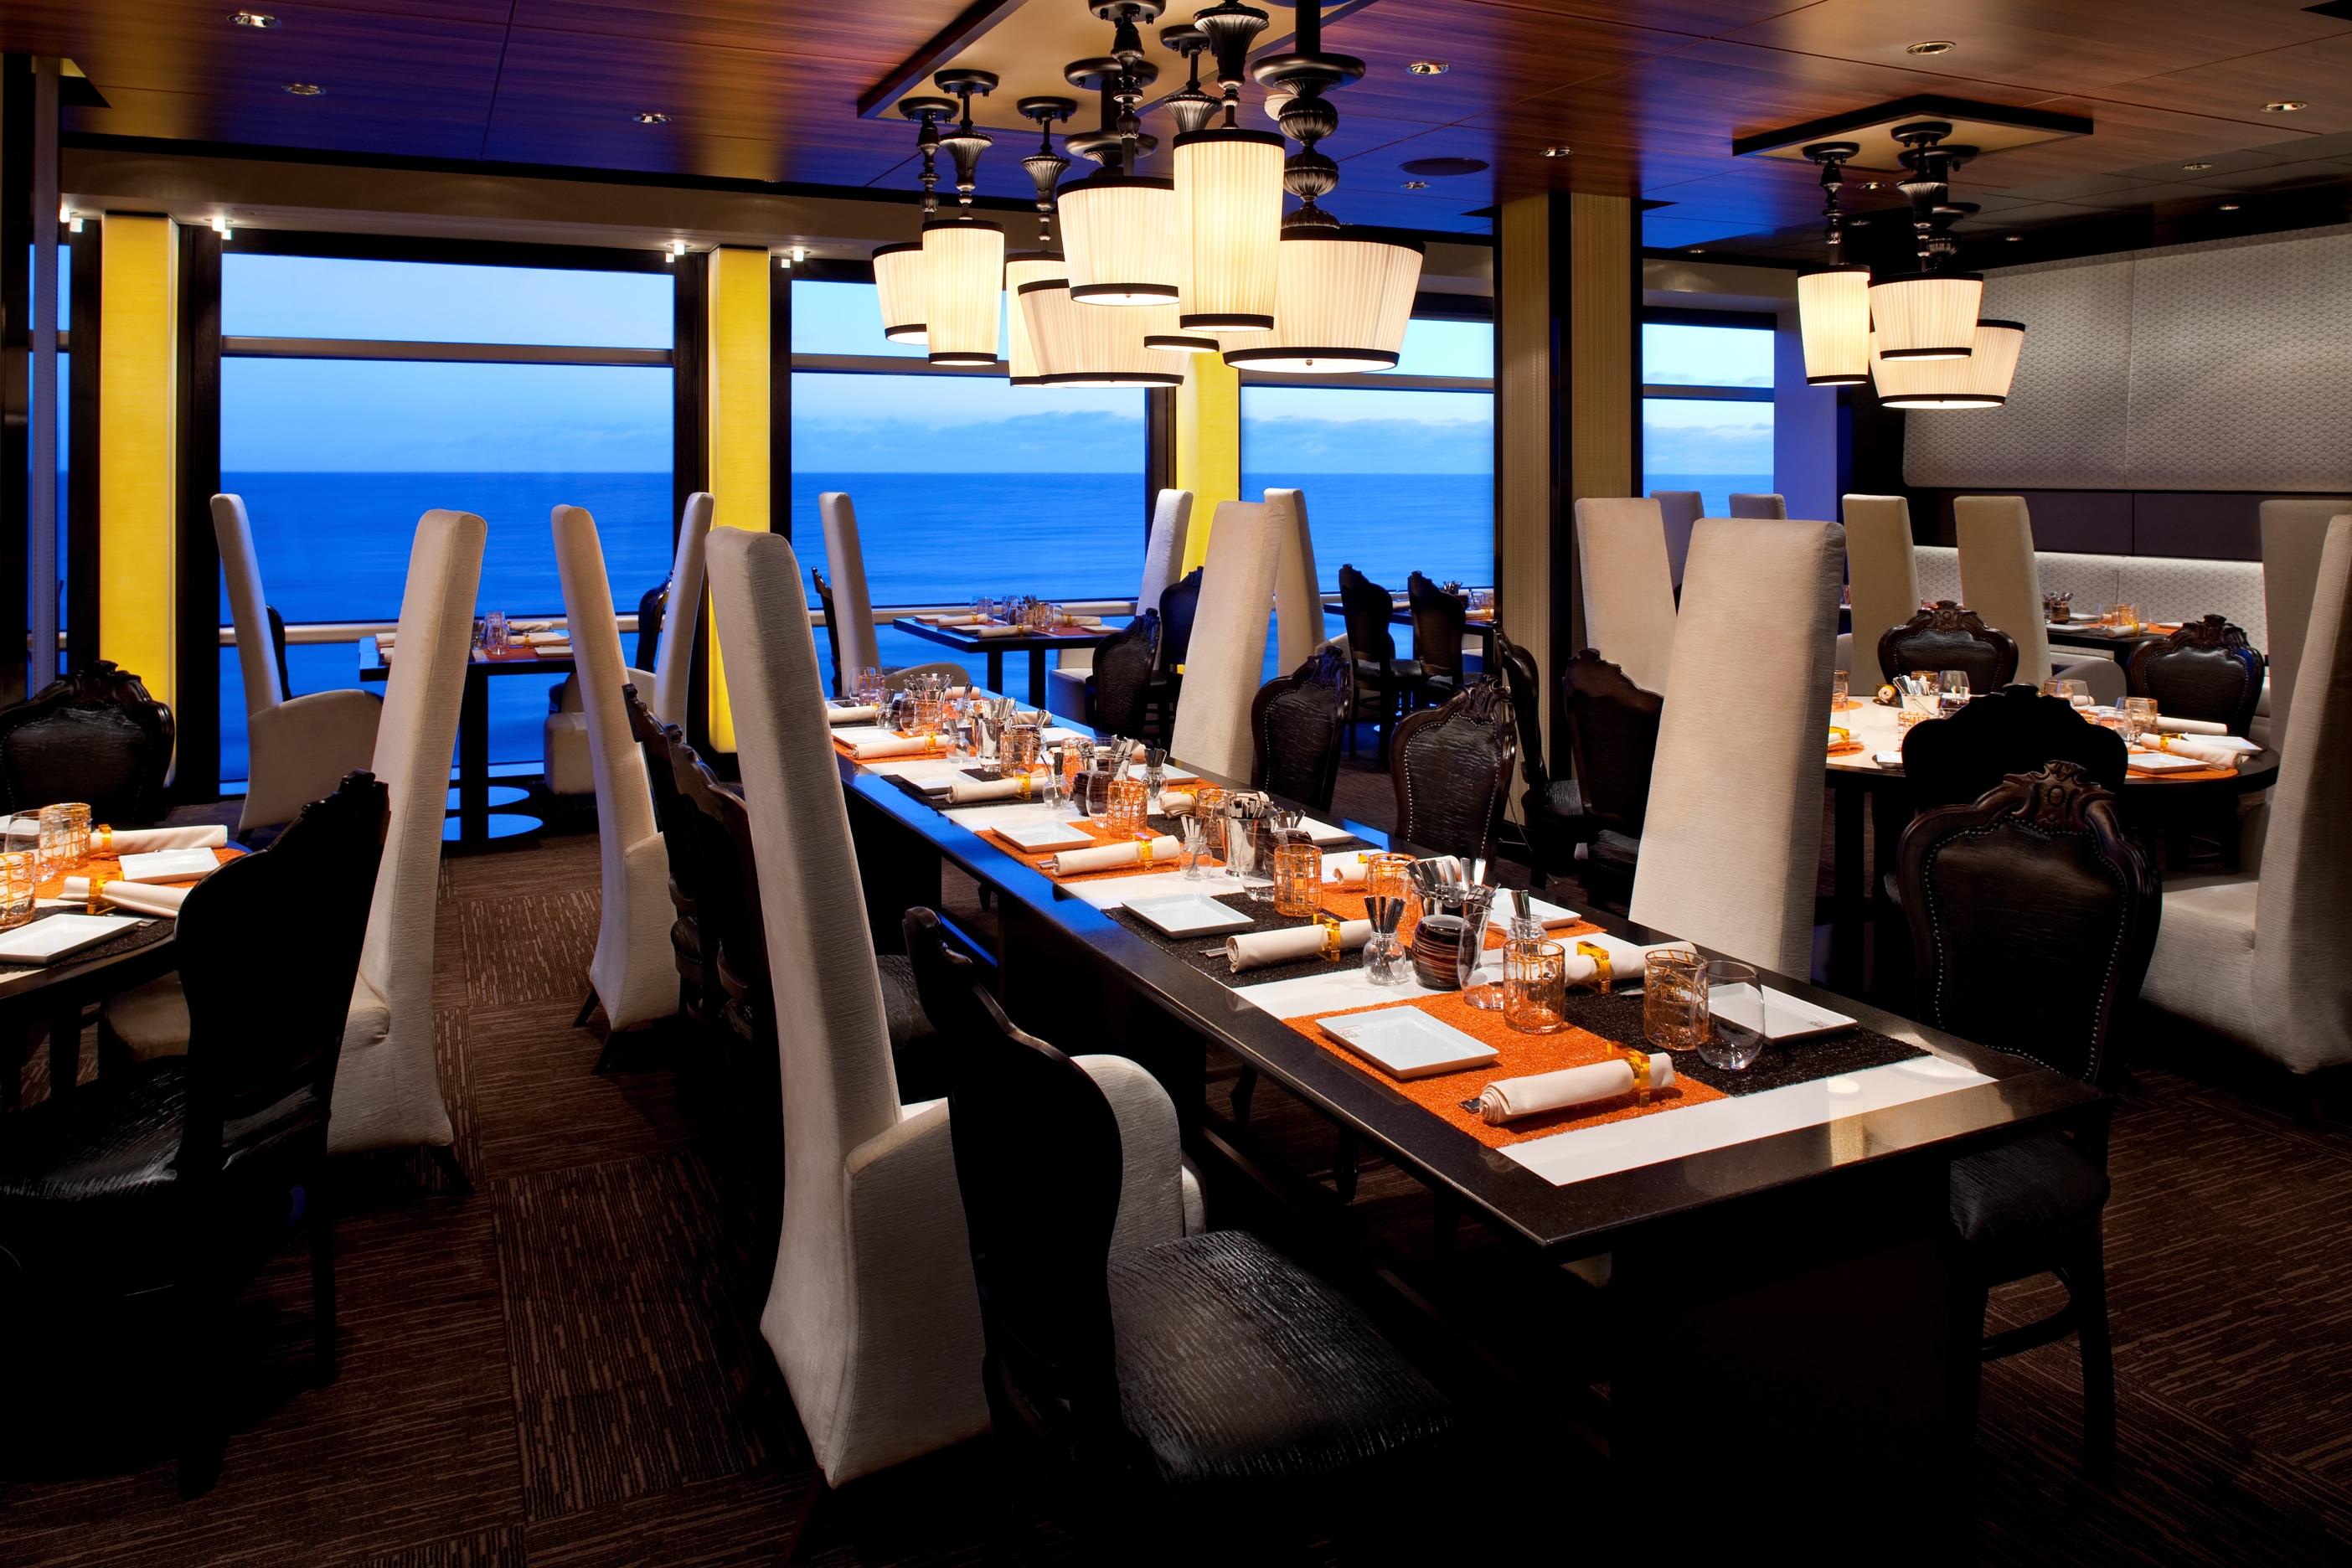 celebrity cruises celebrity eclipse Qsine restaurant.jpg